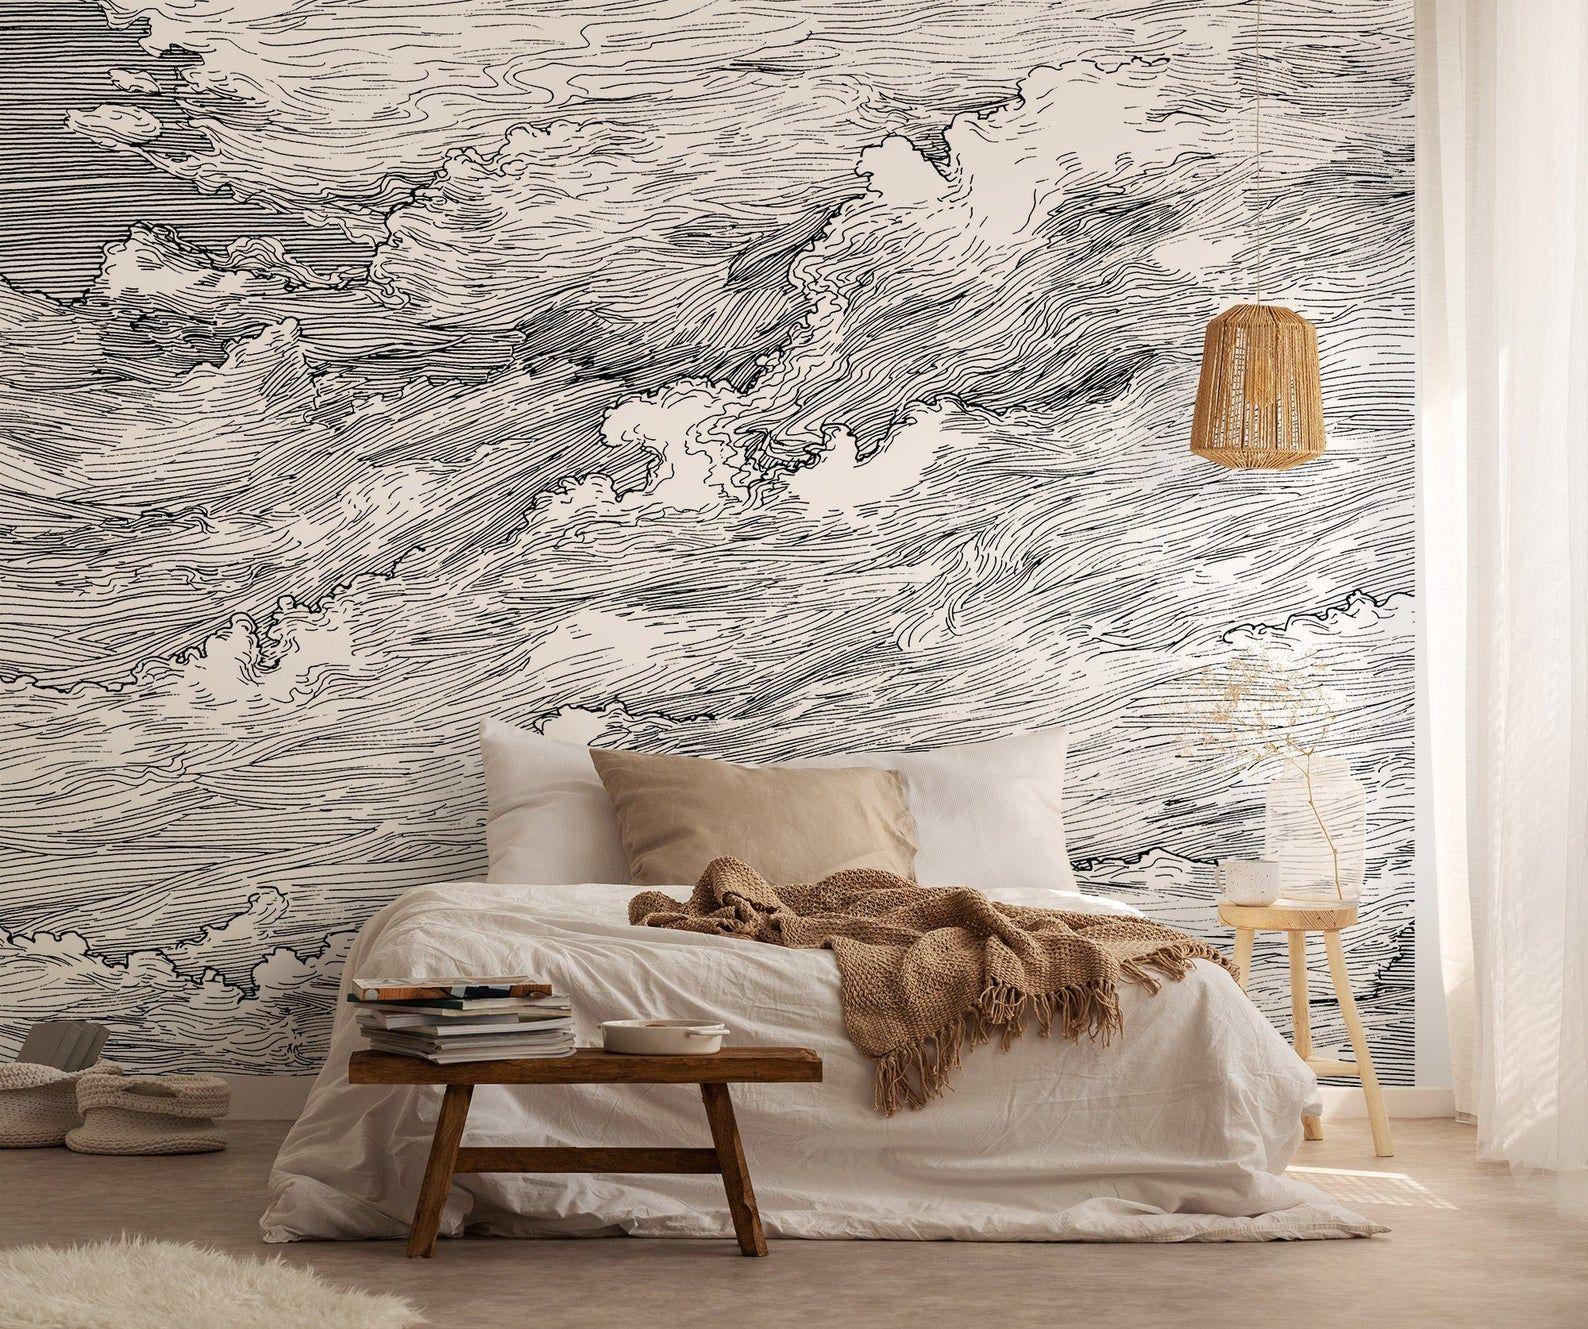 Drawn clouds retro wallpaper, removable wallpaper, self